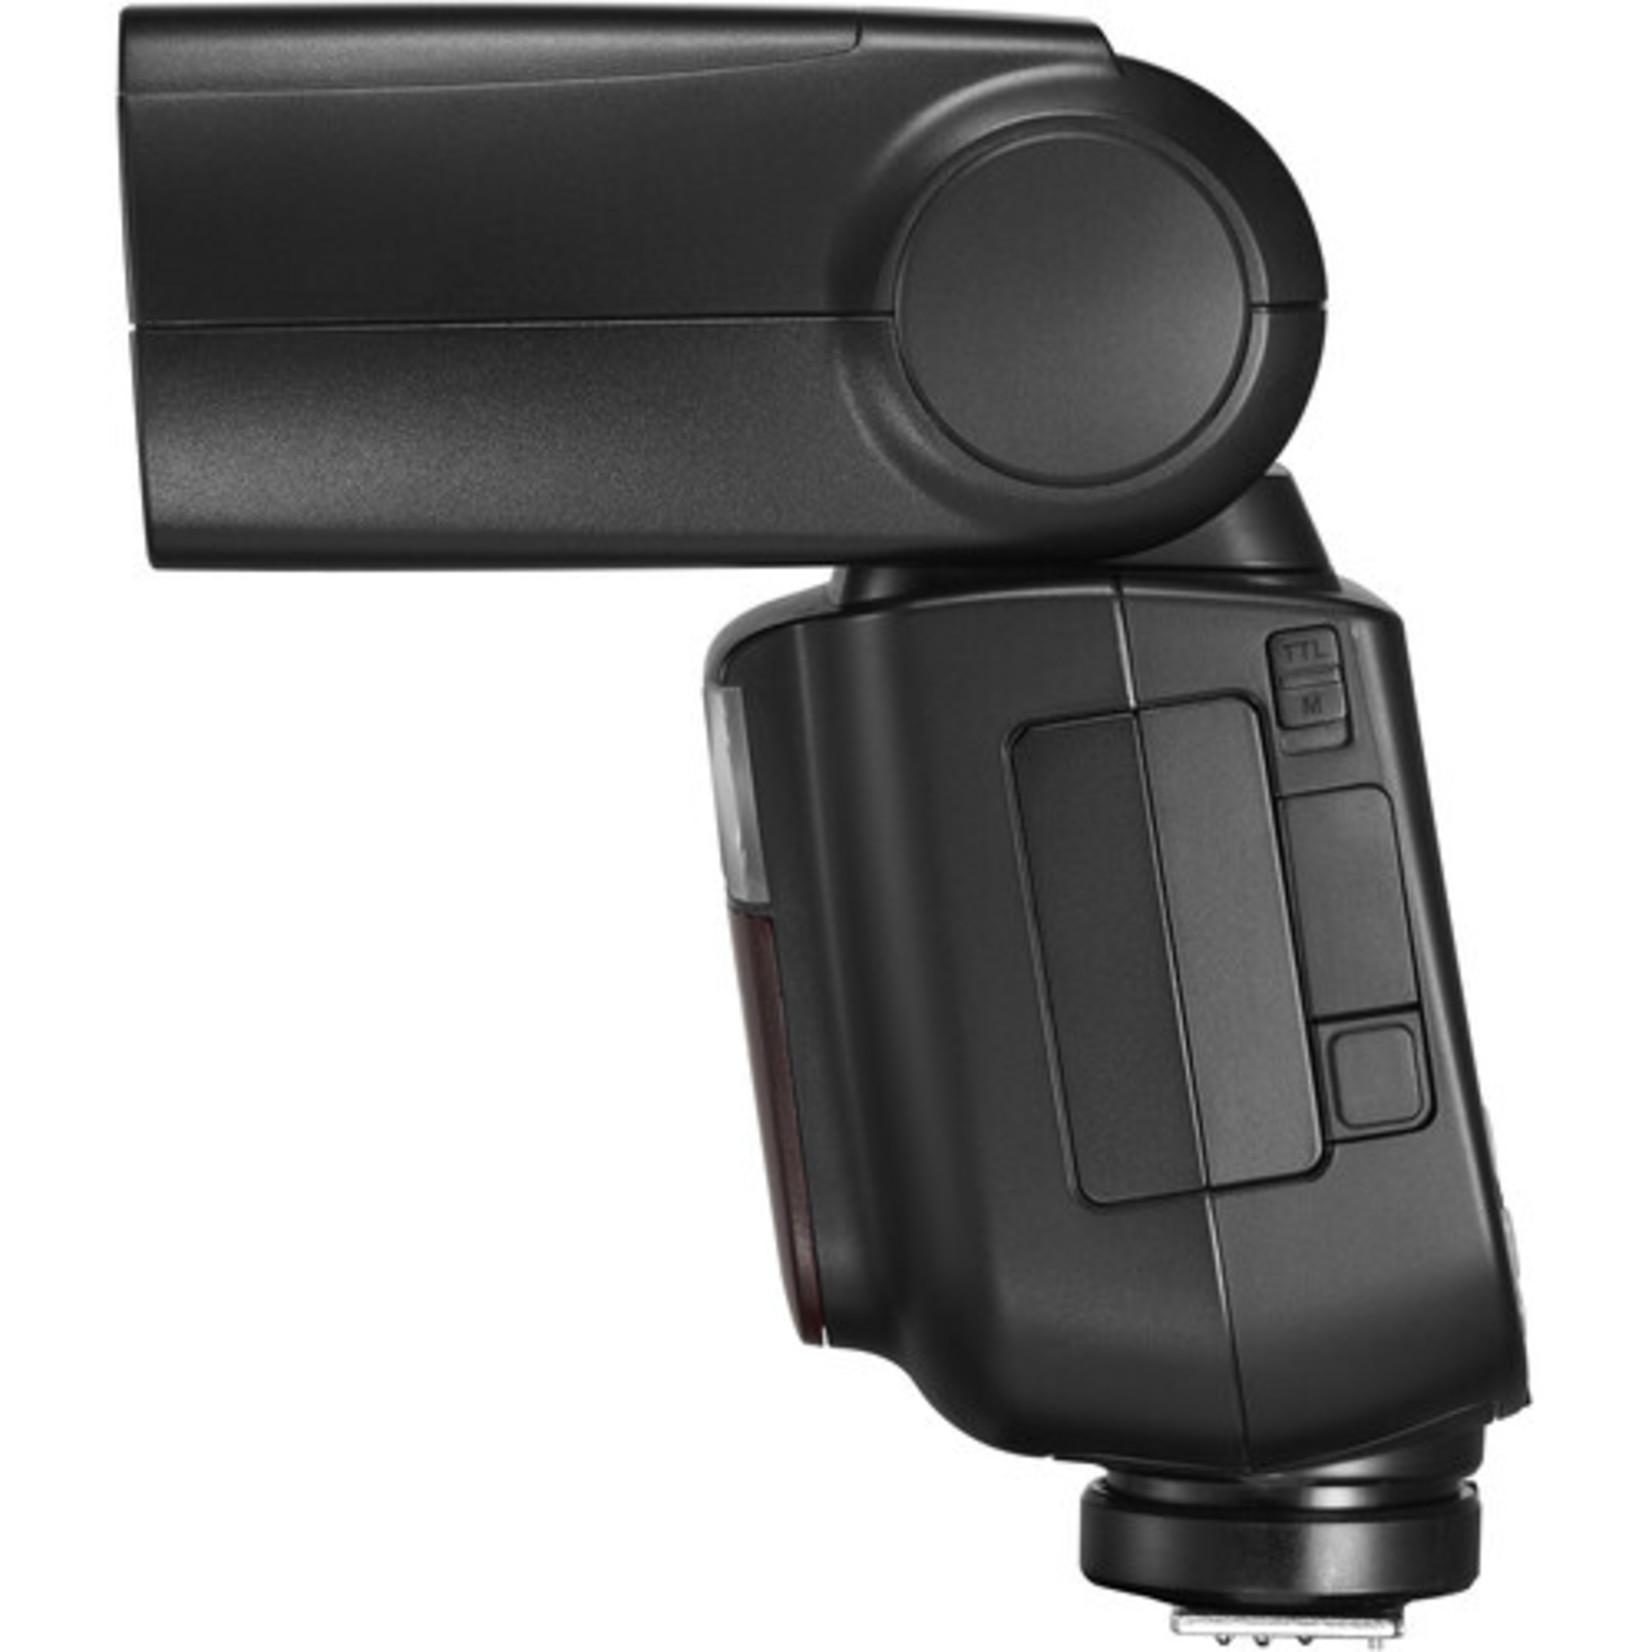 Godox Godox VING V860IIIC TTL Li-Ion Flash Kit for Canon Cameras